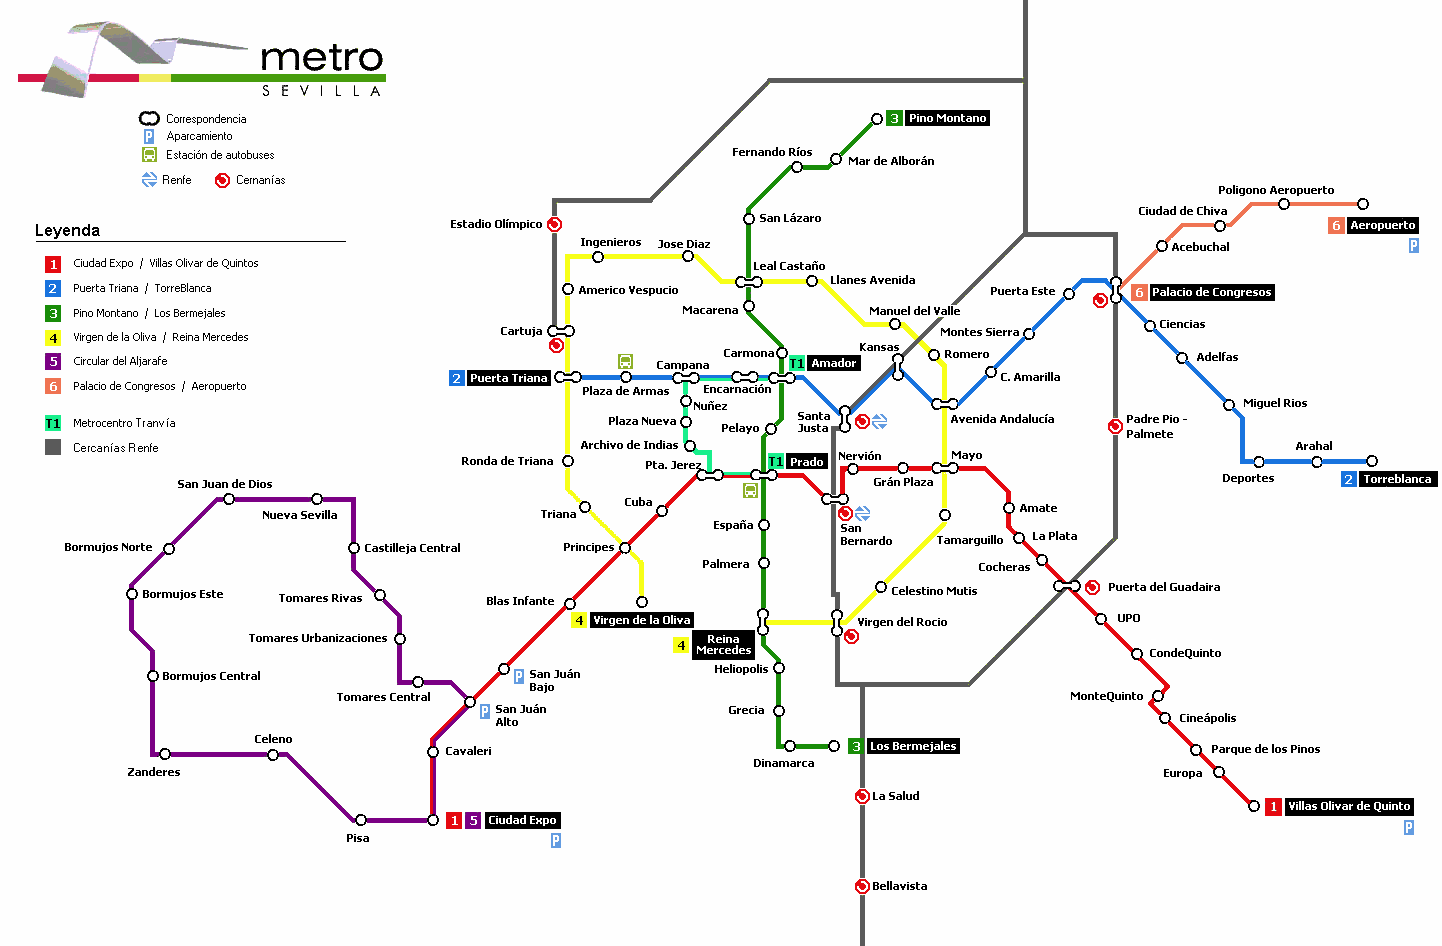 Seville future metro map